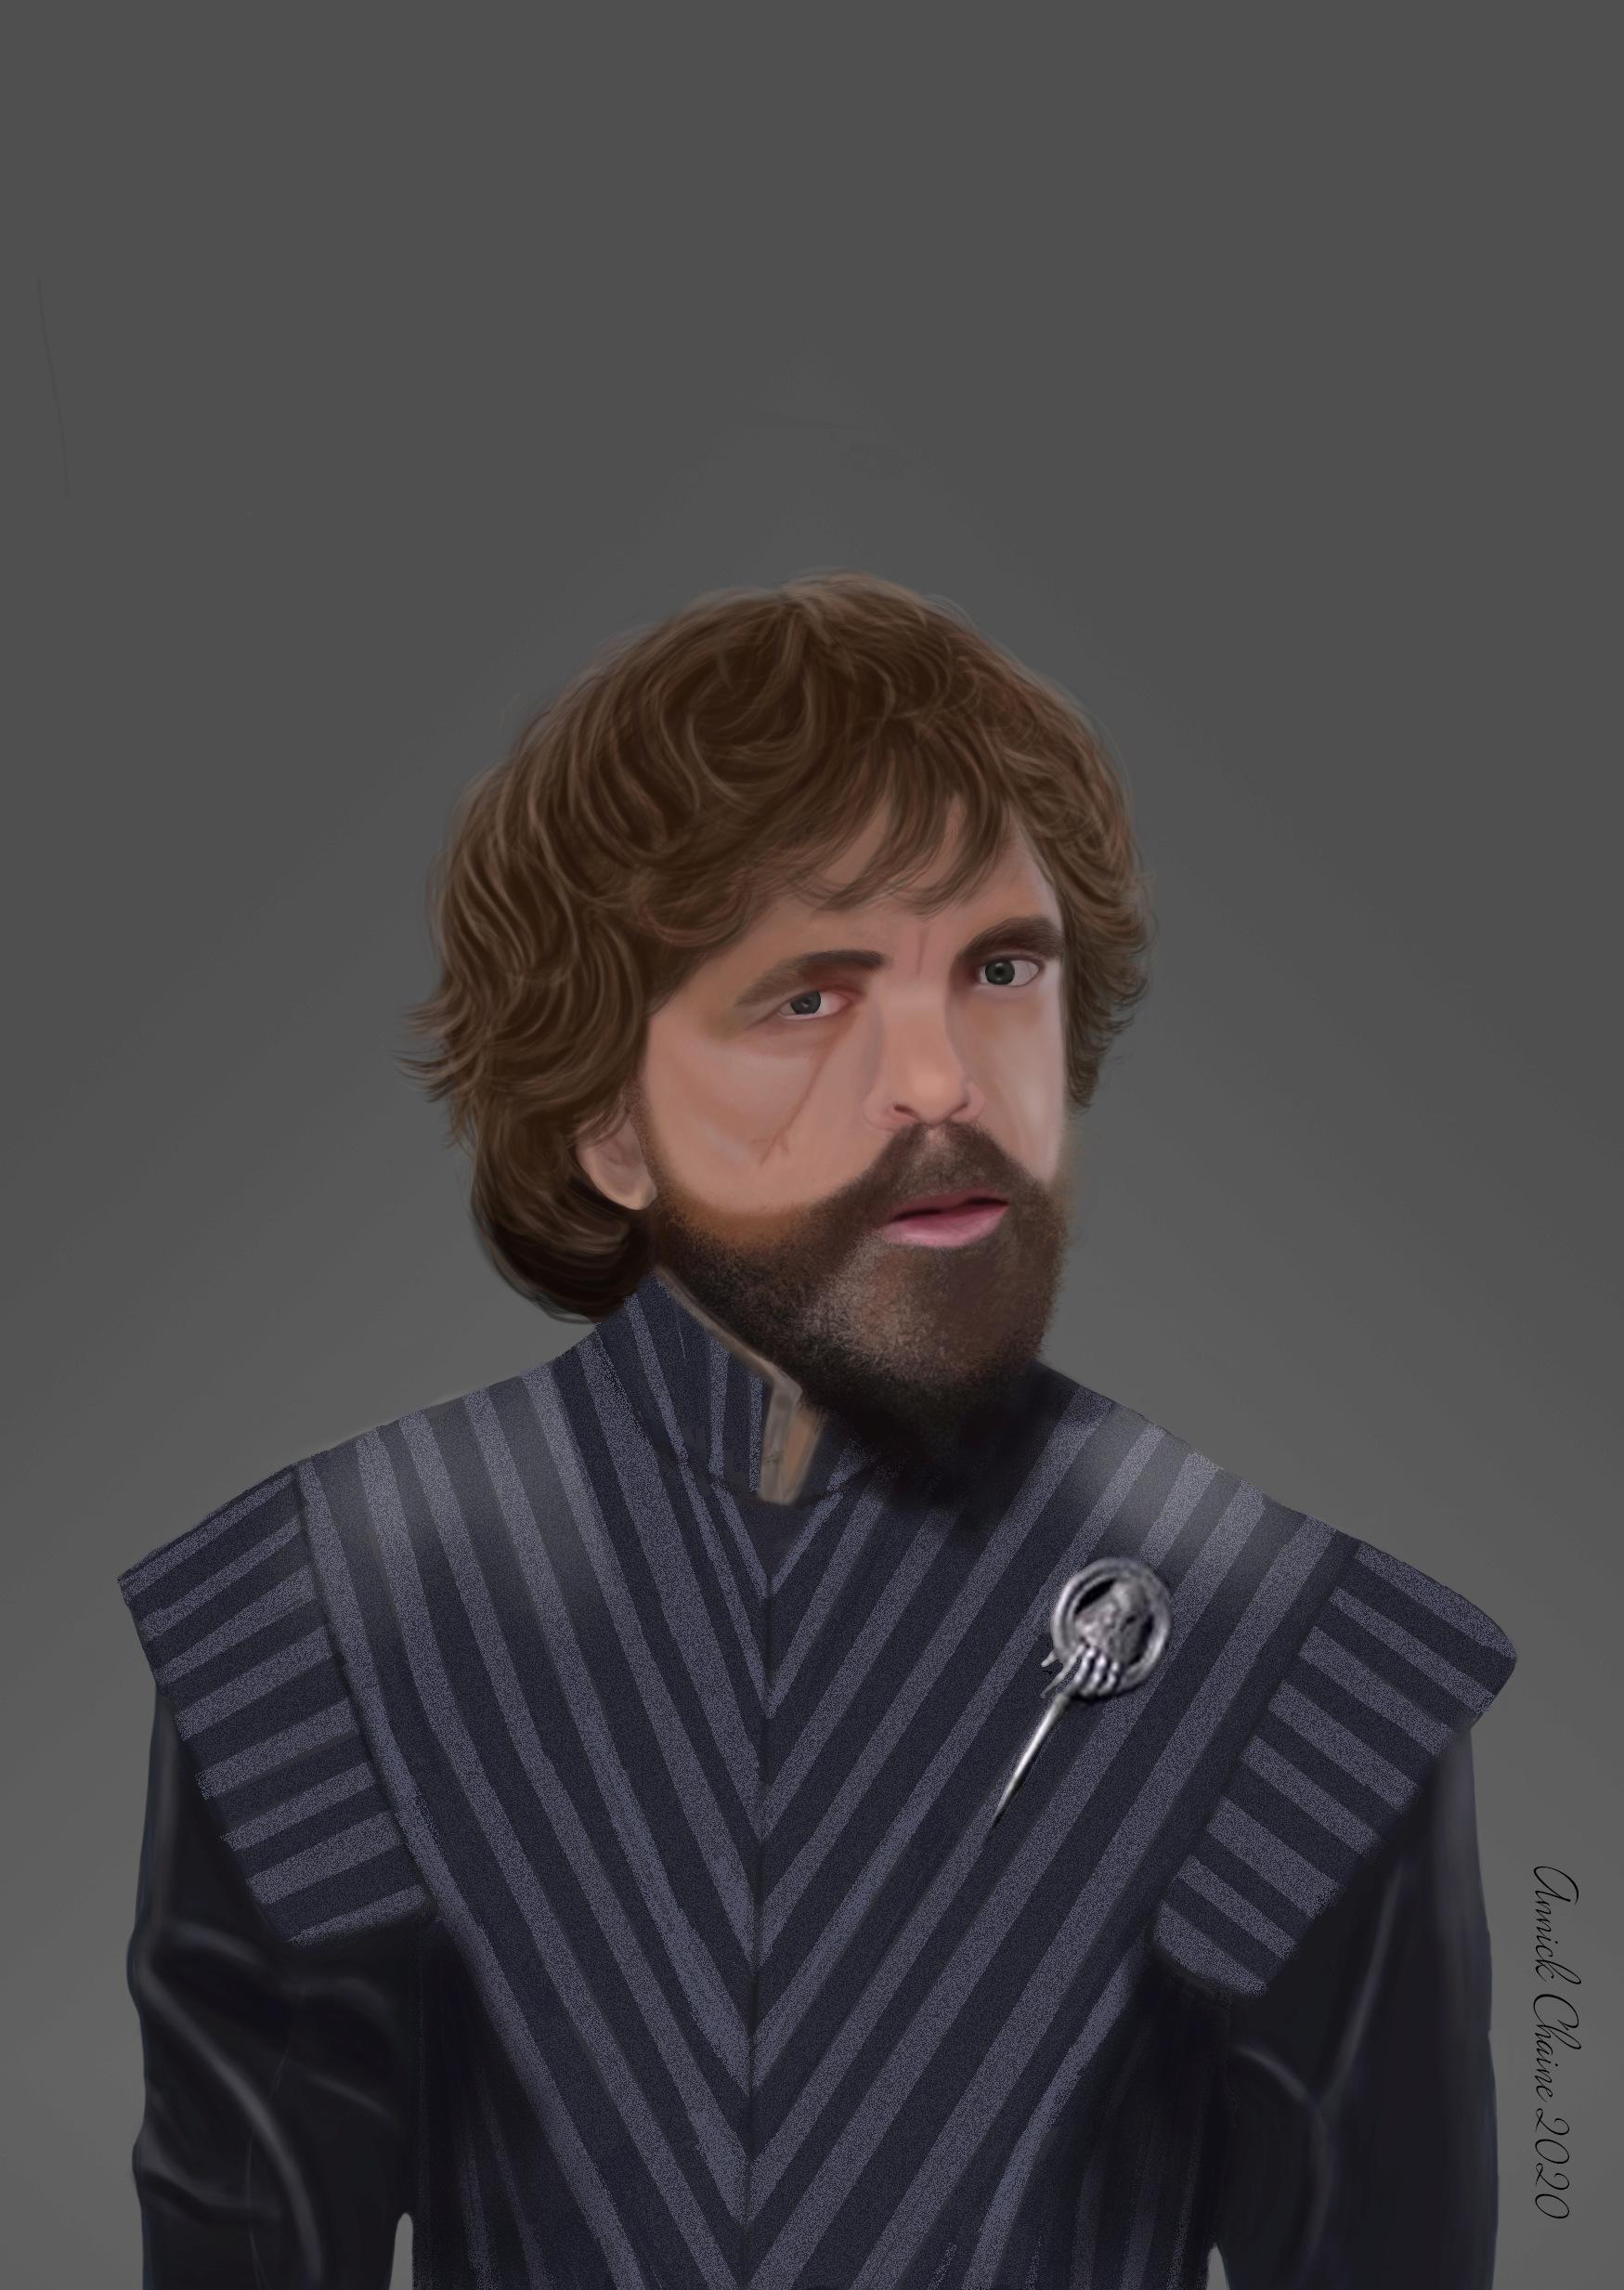 Painting de Petite_Perle Tyrion10